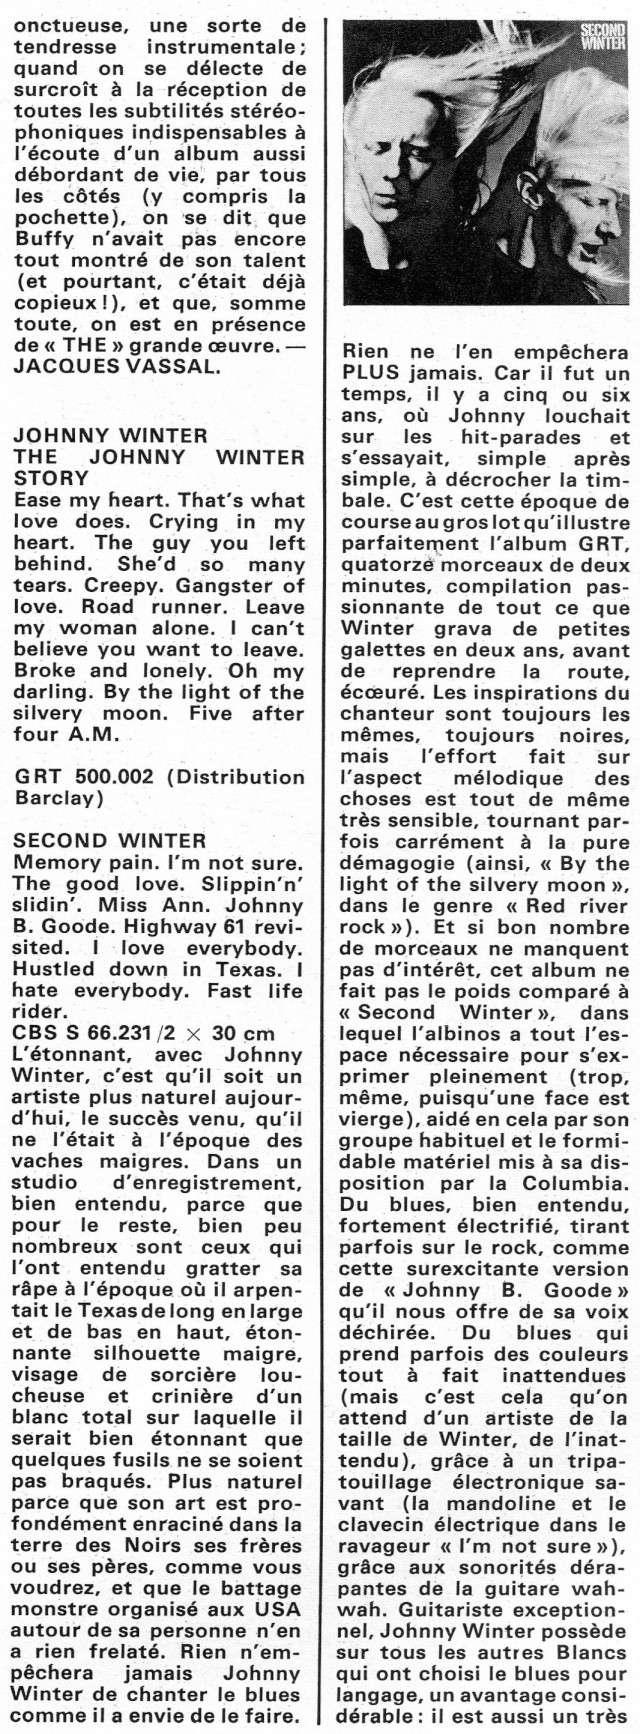 Johnny Winter (1969) R40-0319